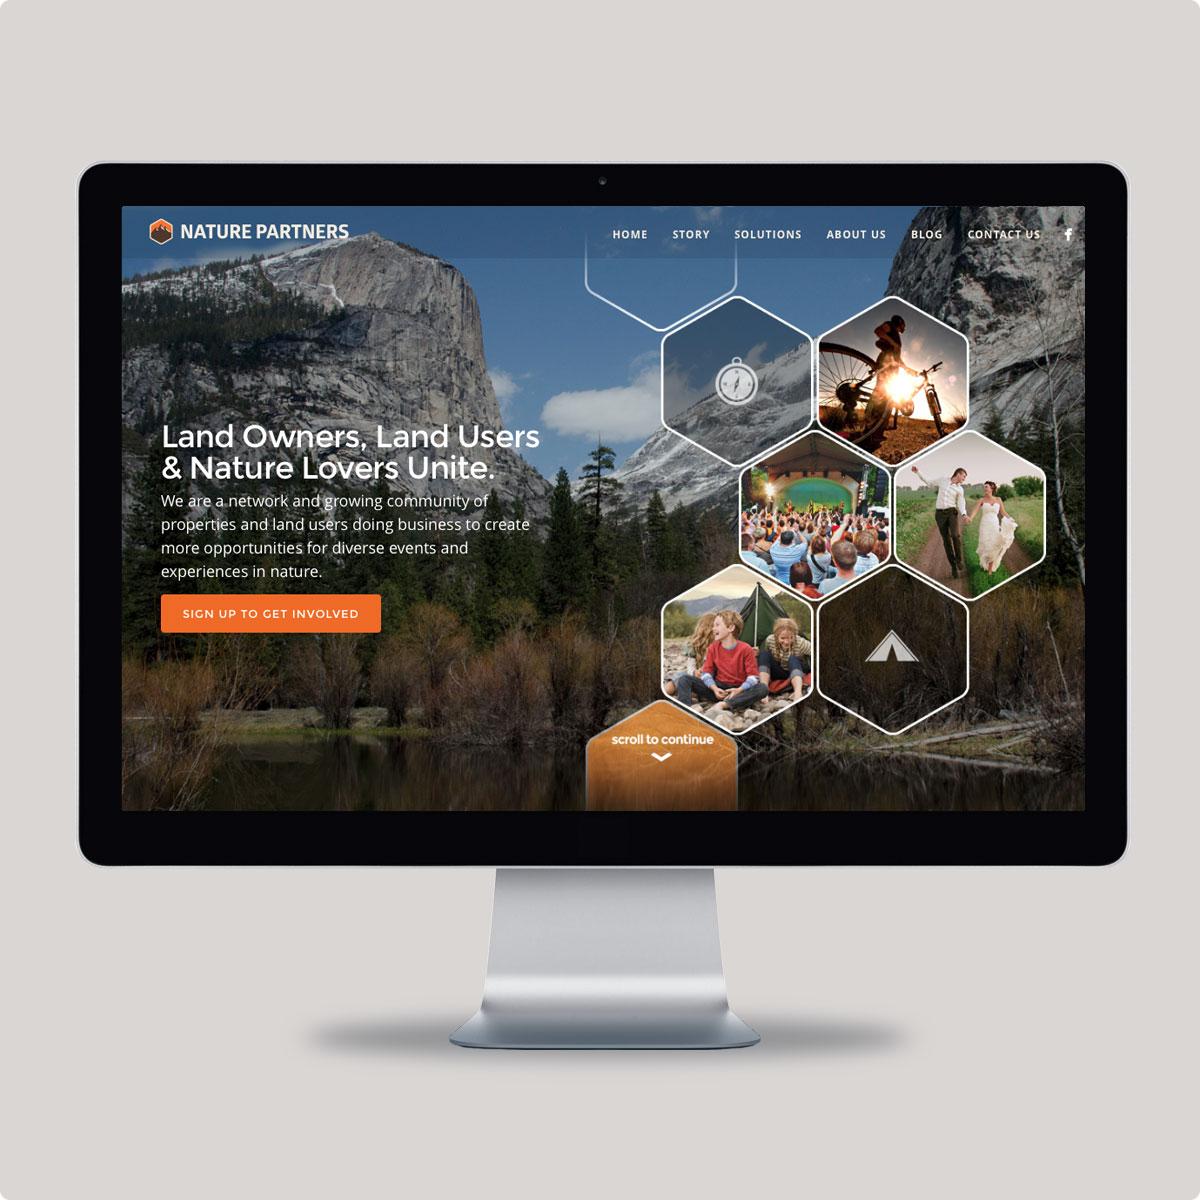 nature-partners-web-portfolio-thumbs.jpg